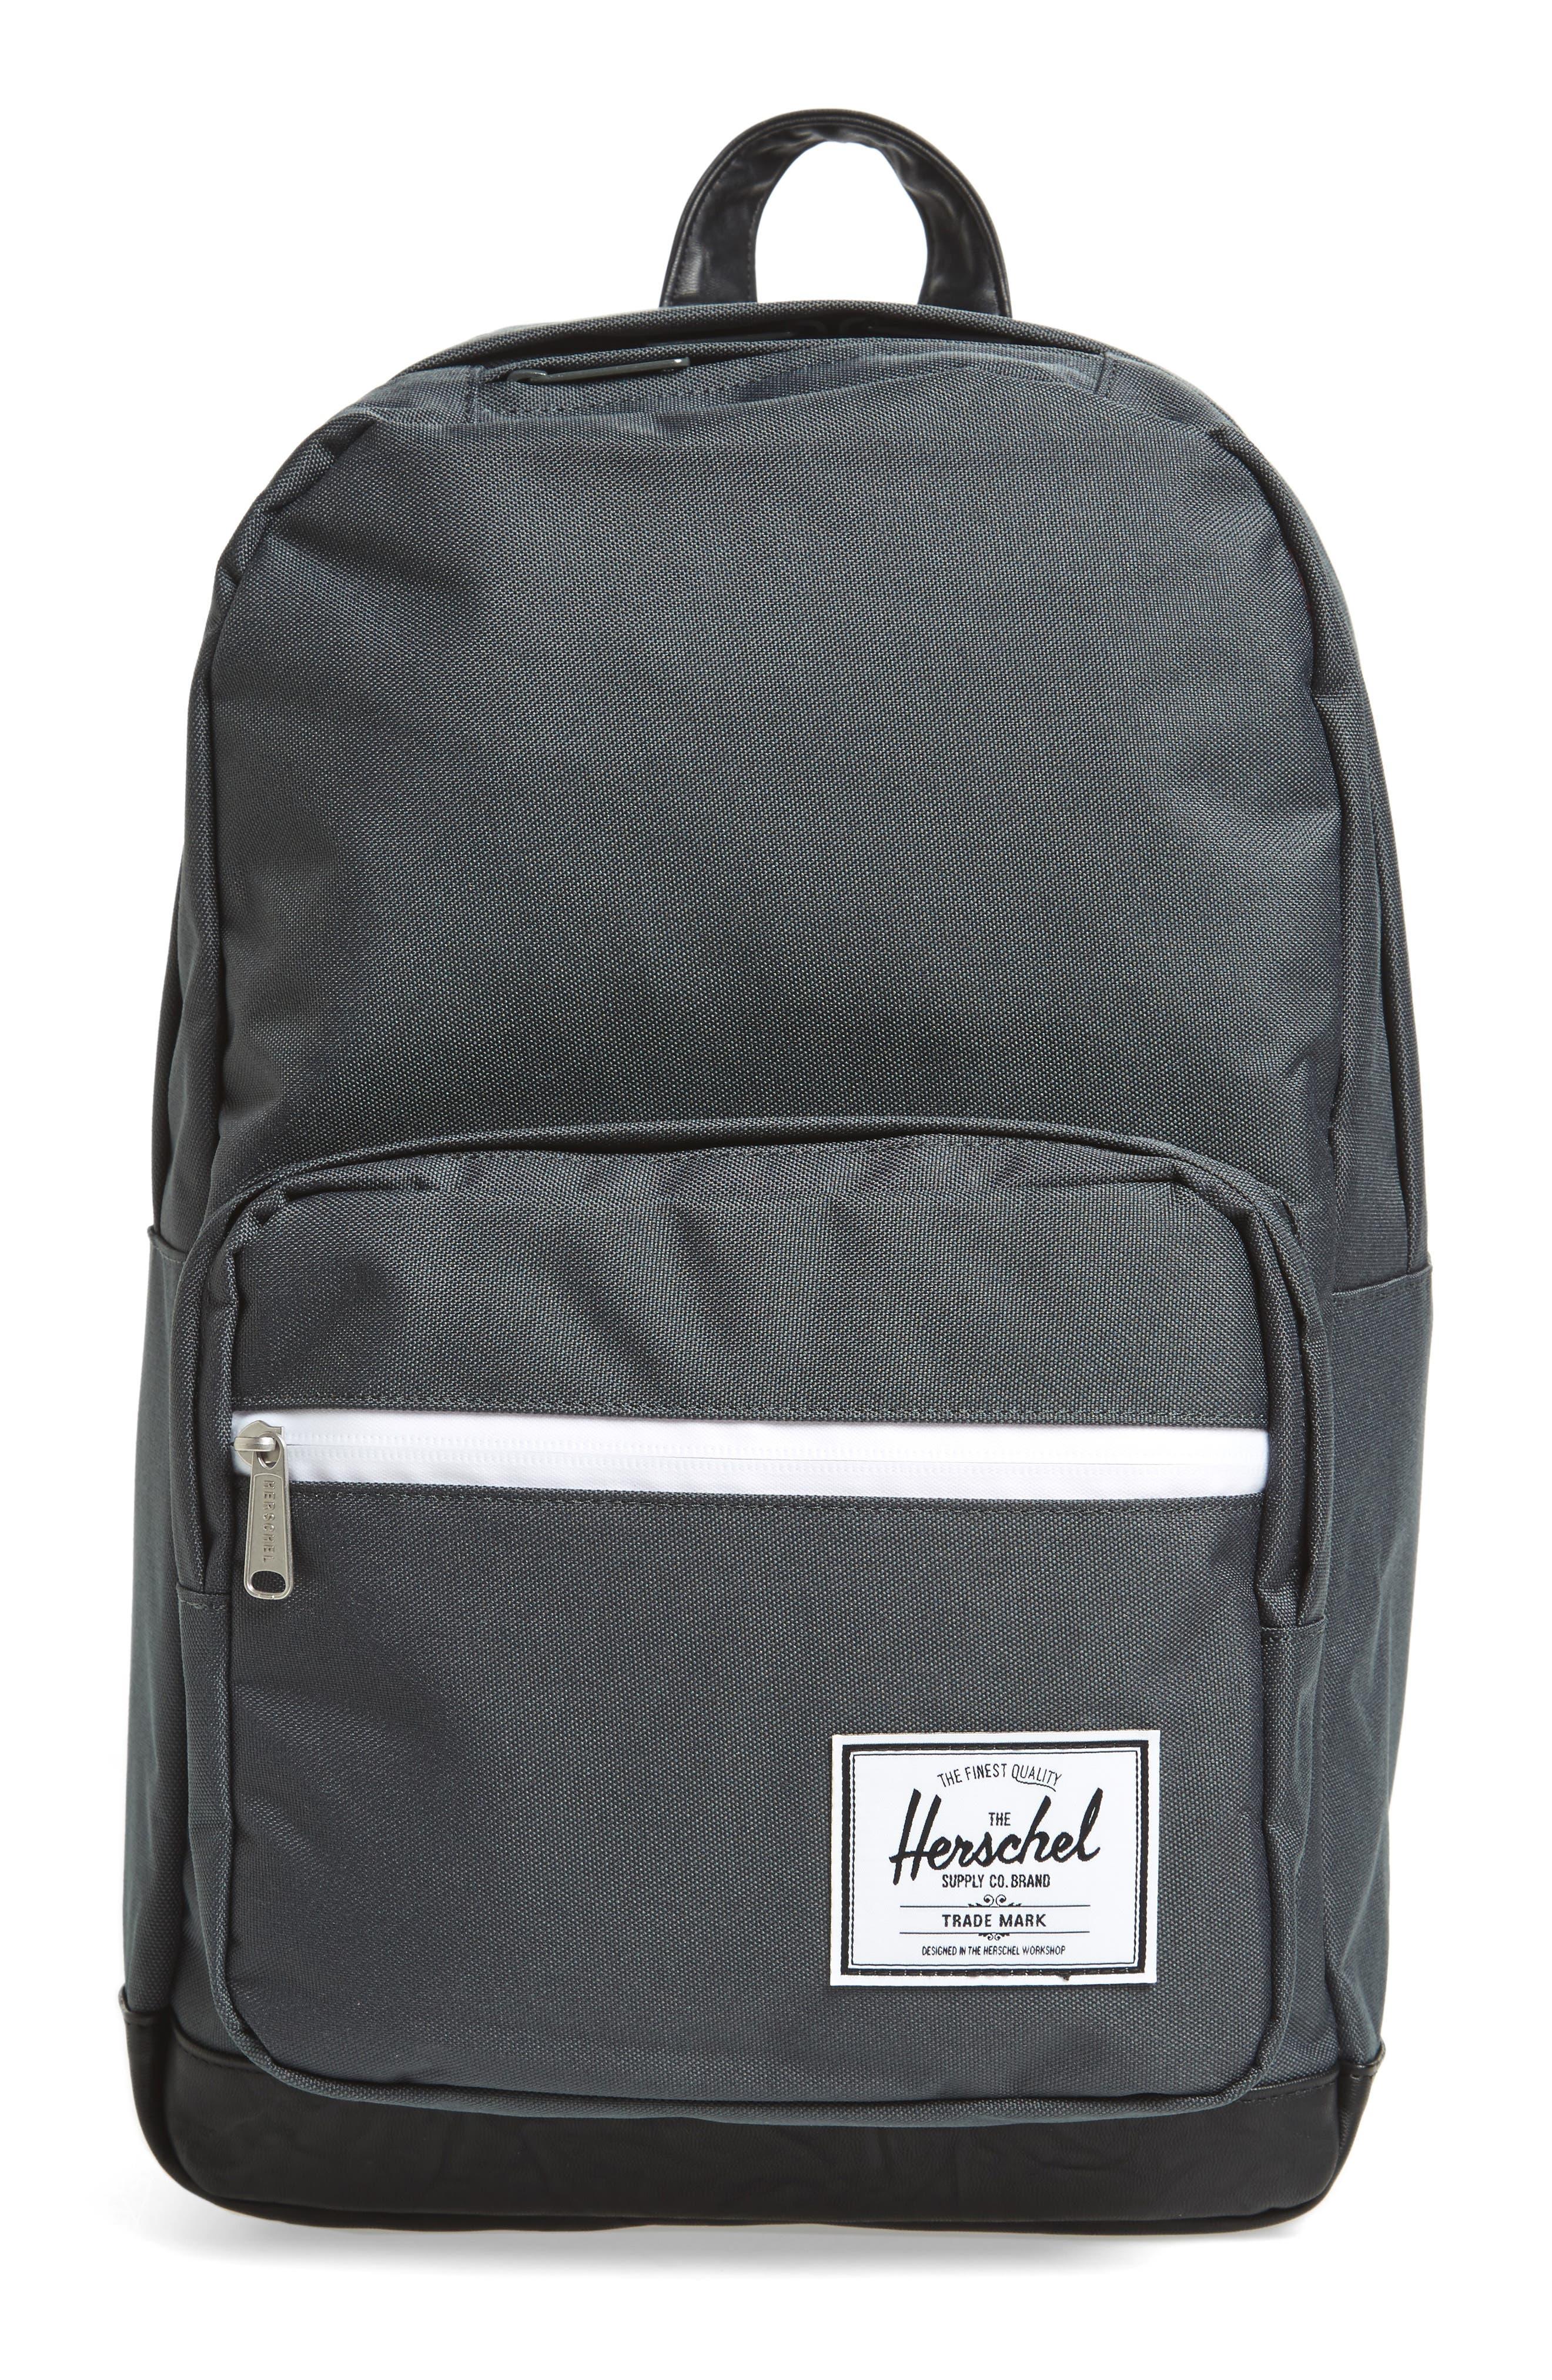 Herschel Supply Co. Men s Backpacks Accessories   Nordstrom 5e7afcad2b